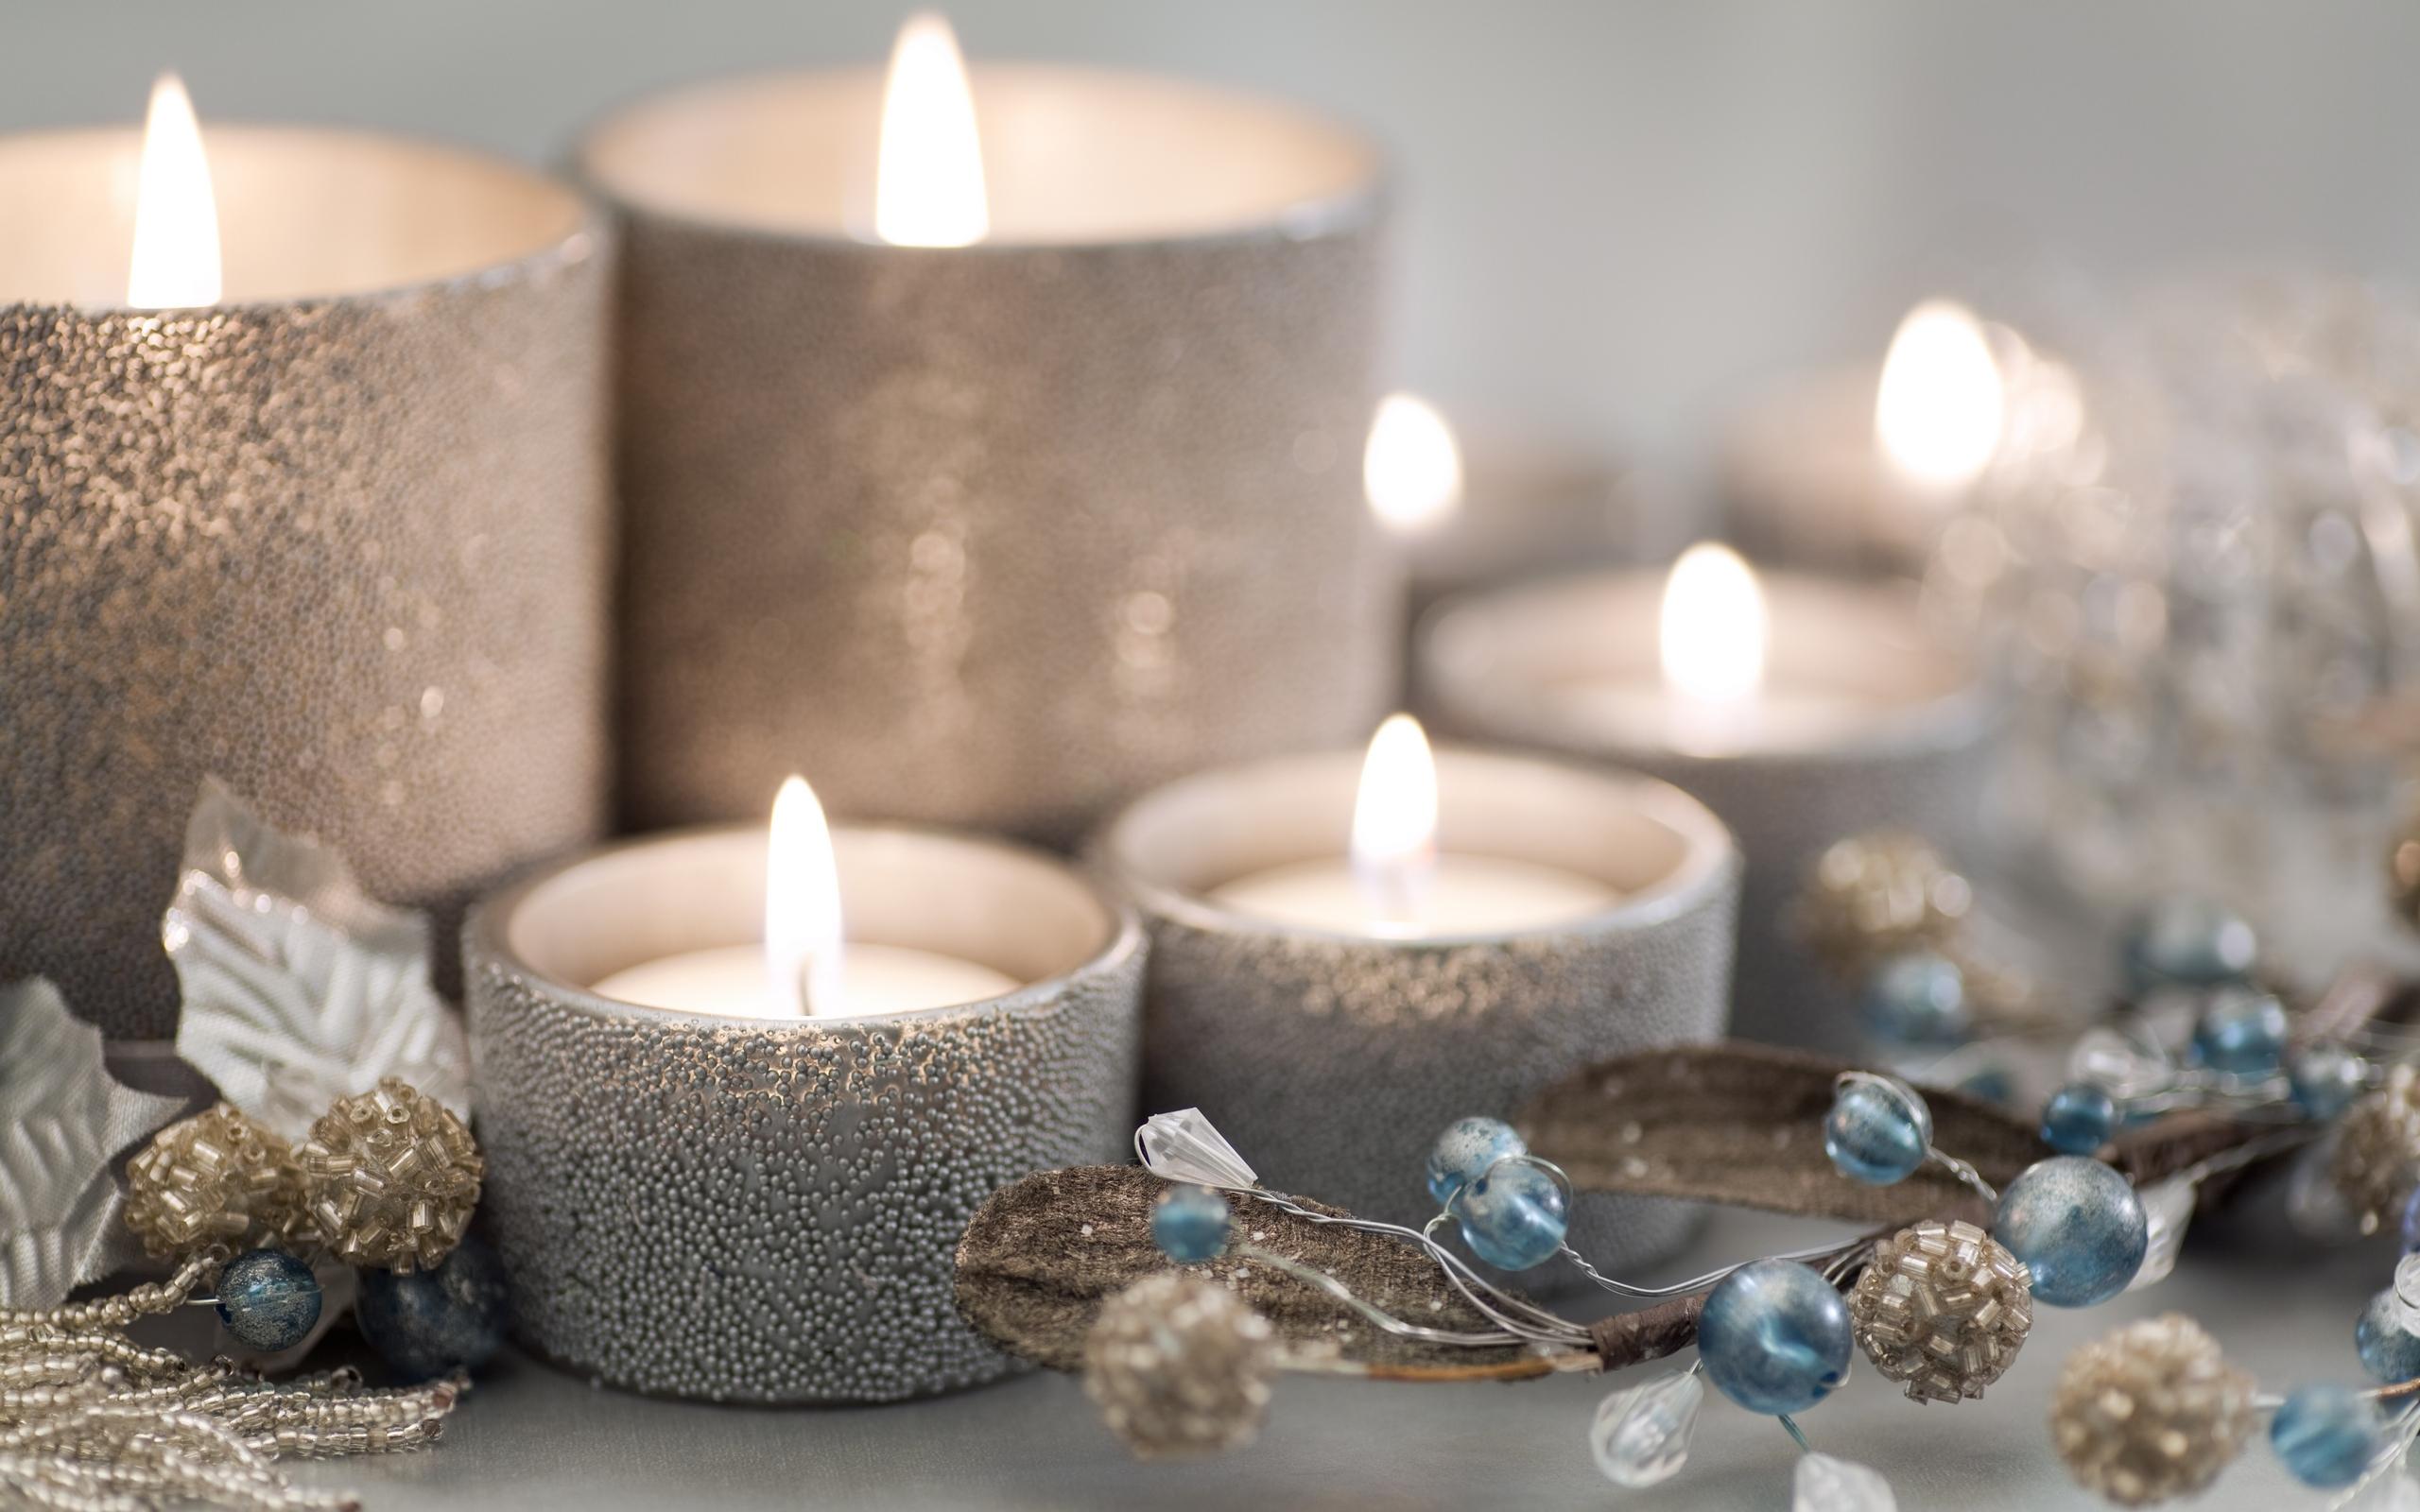 Christmas Wallpaper Lights And Candles Wallpapersafari